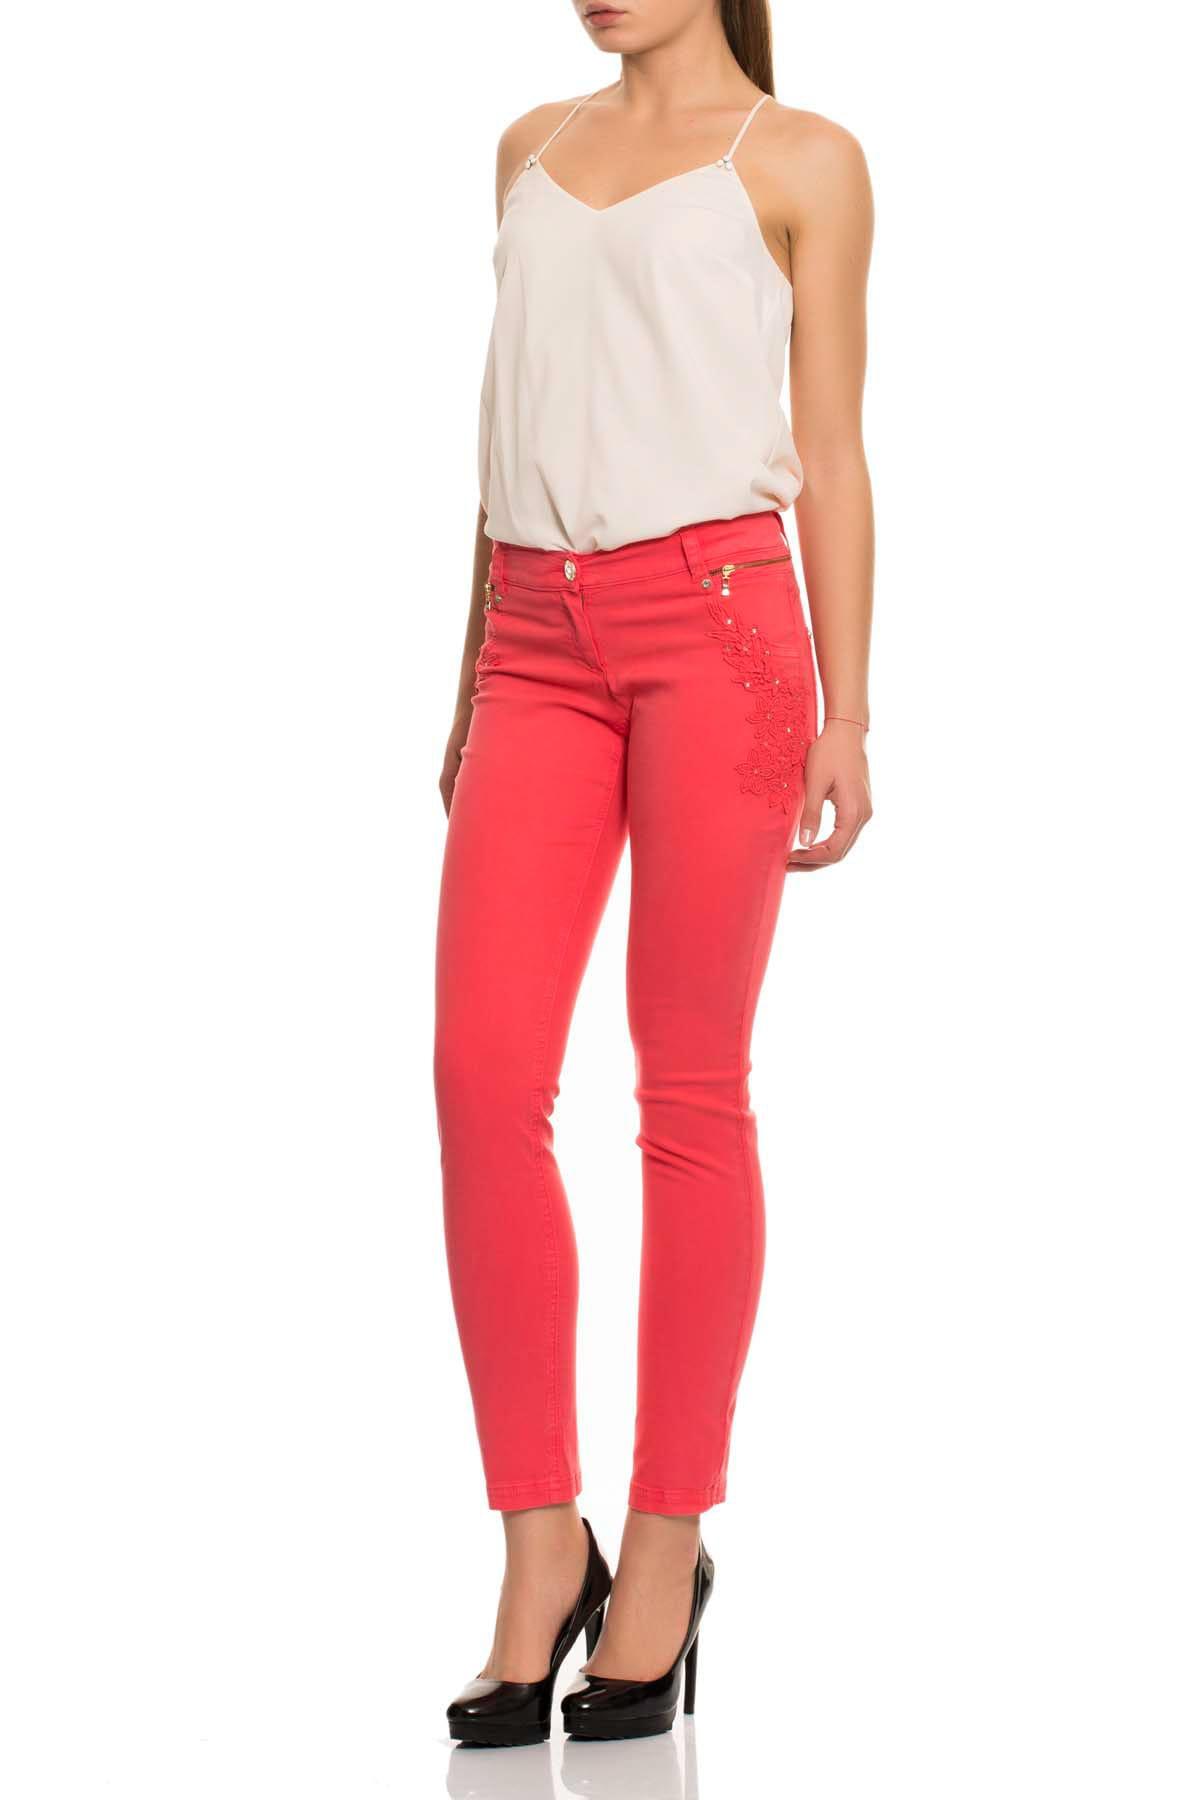 GIZIA CASUAL Kadın Mercan Rengi Skinny Kot Pantolon M15YAS0211C7K 2